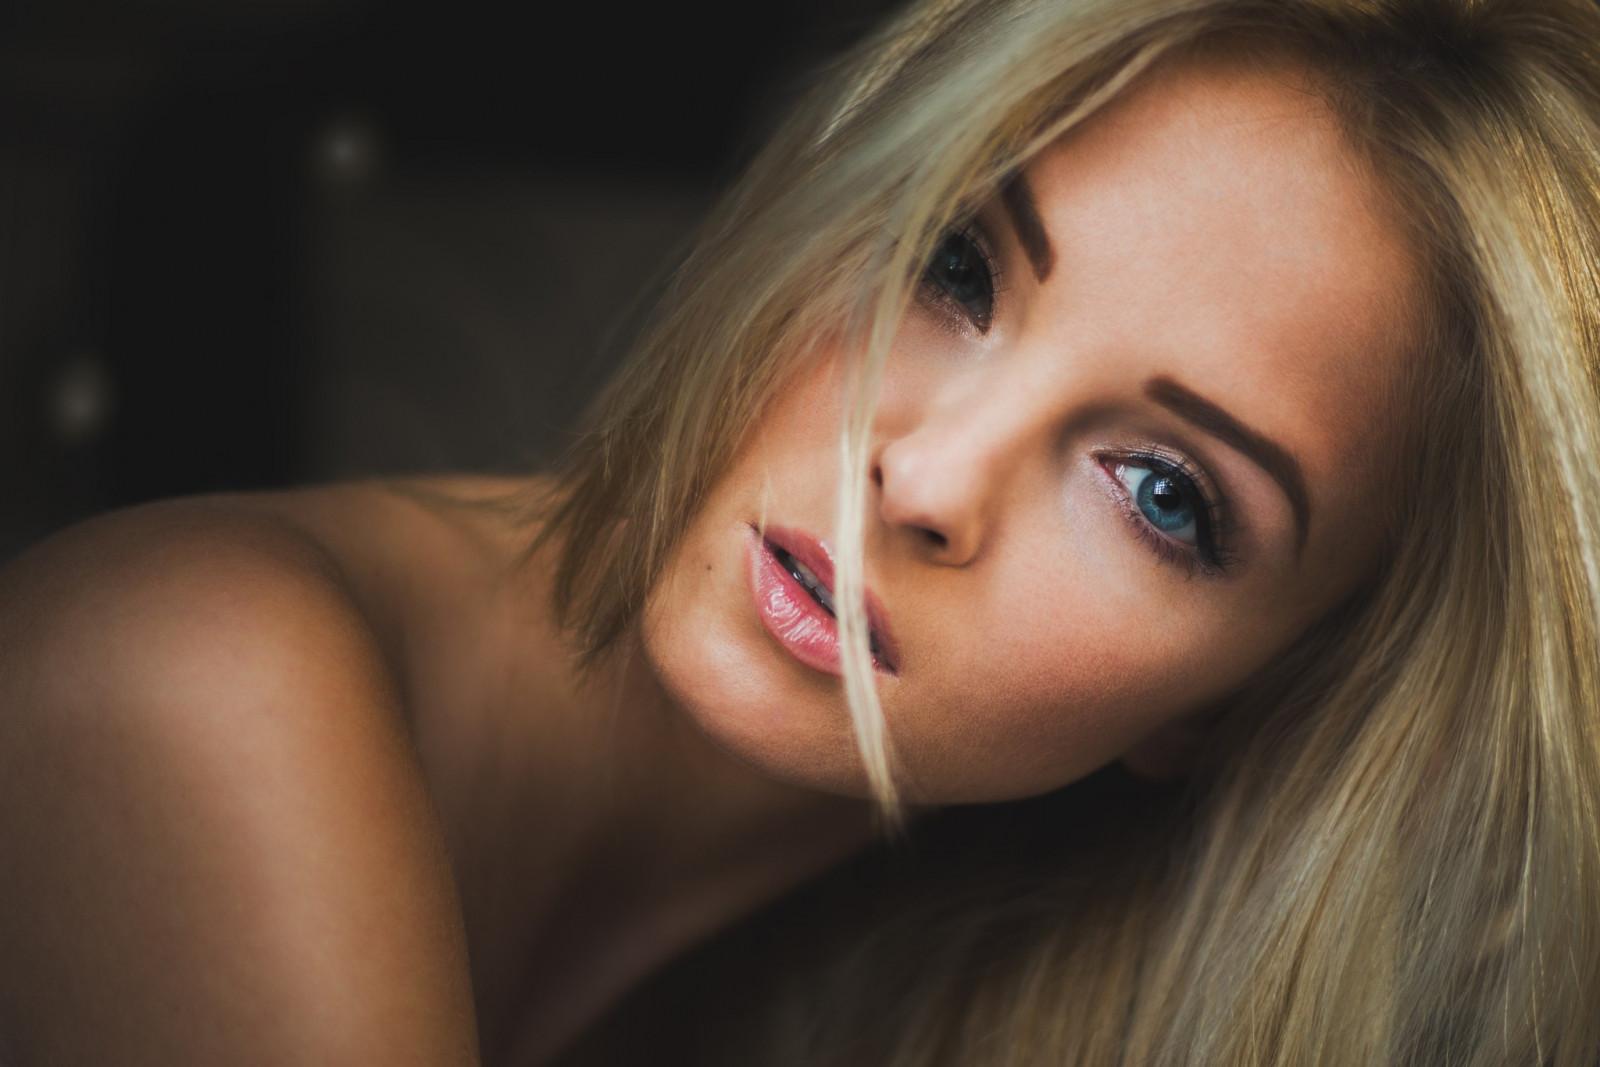 Wallpaper Face Model Blonde Long Hair Blue Eyes: Wallpaper : Face, Women, Blonde, Long Hair, Blue Eyes